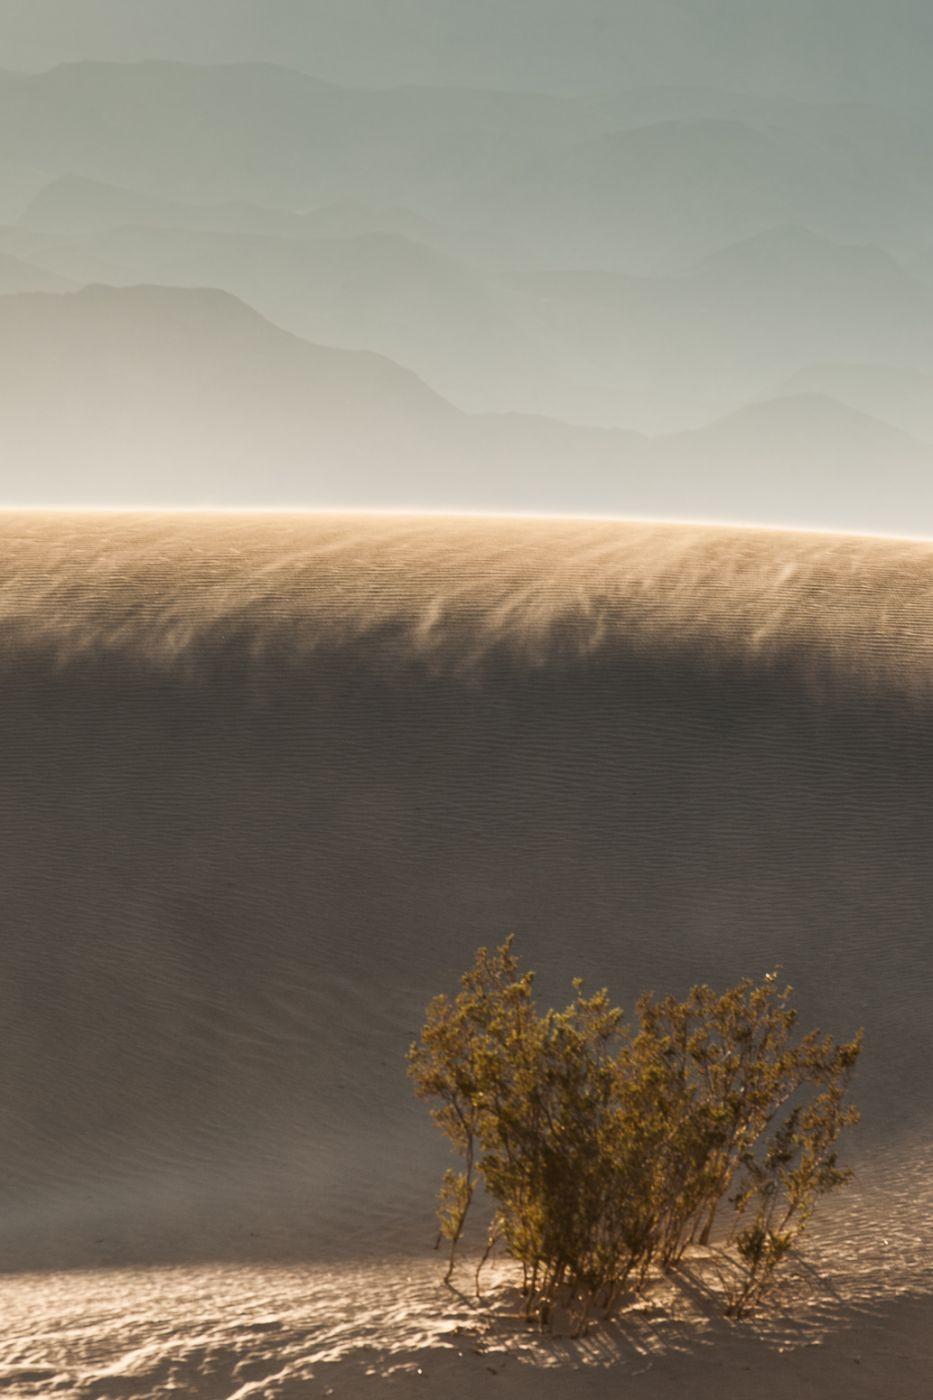 Mesquite Flat Sand Dunes, USA